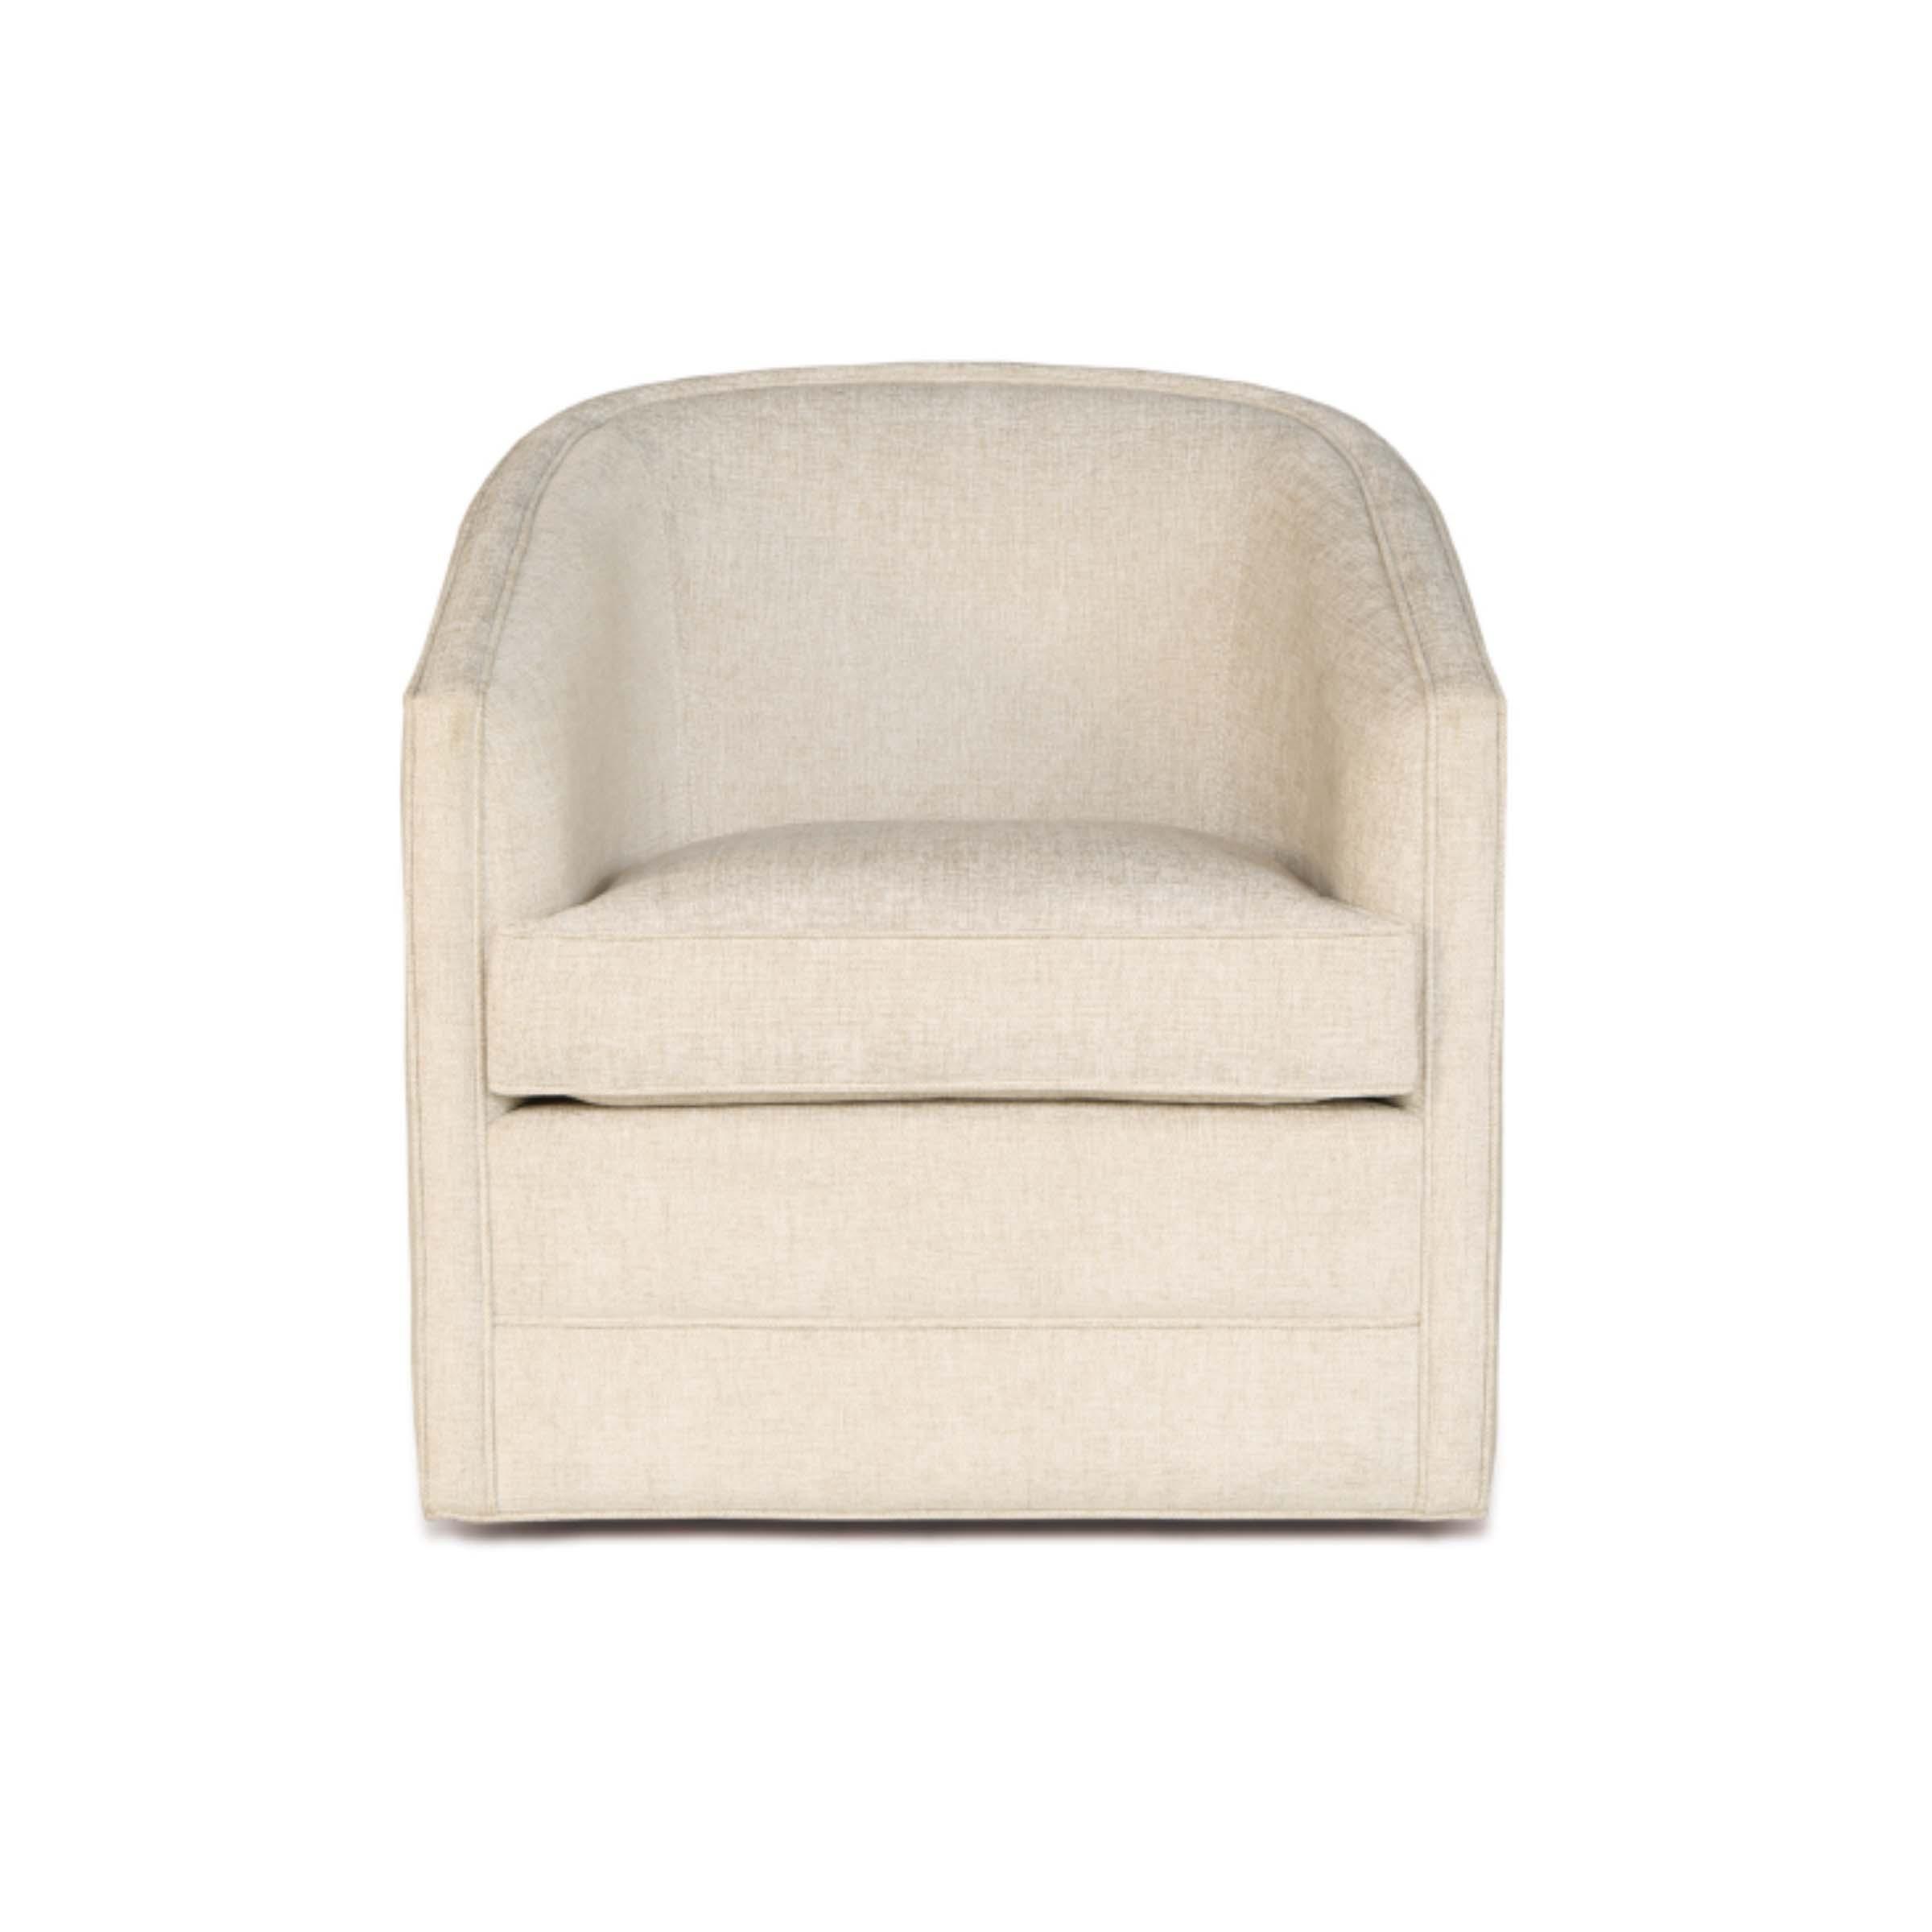 LEUCADIA - 6A Swivel Chair Rodez Sand